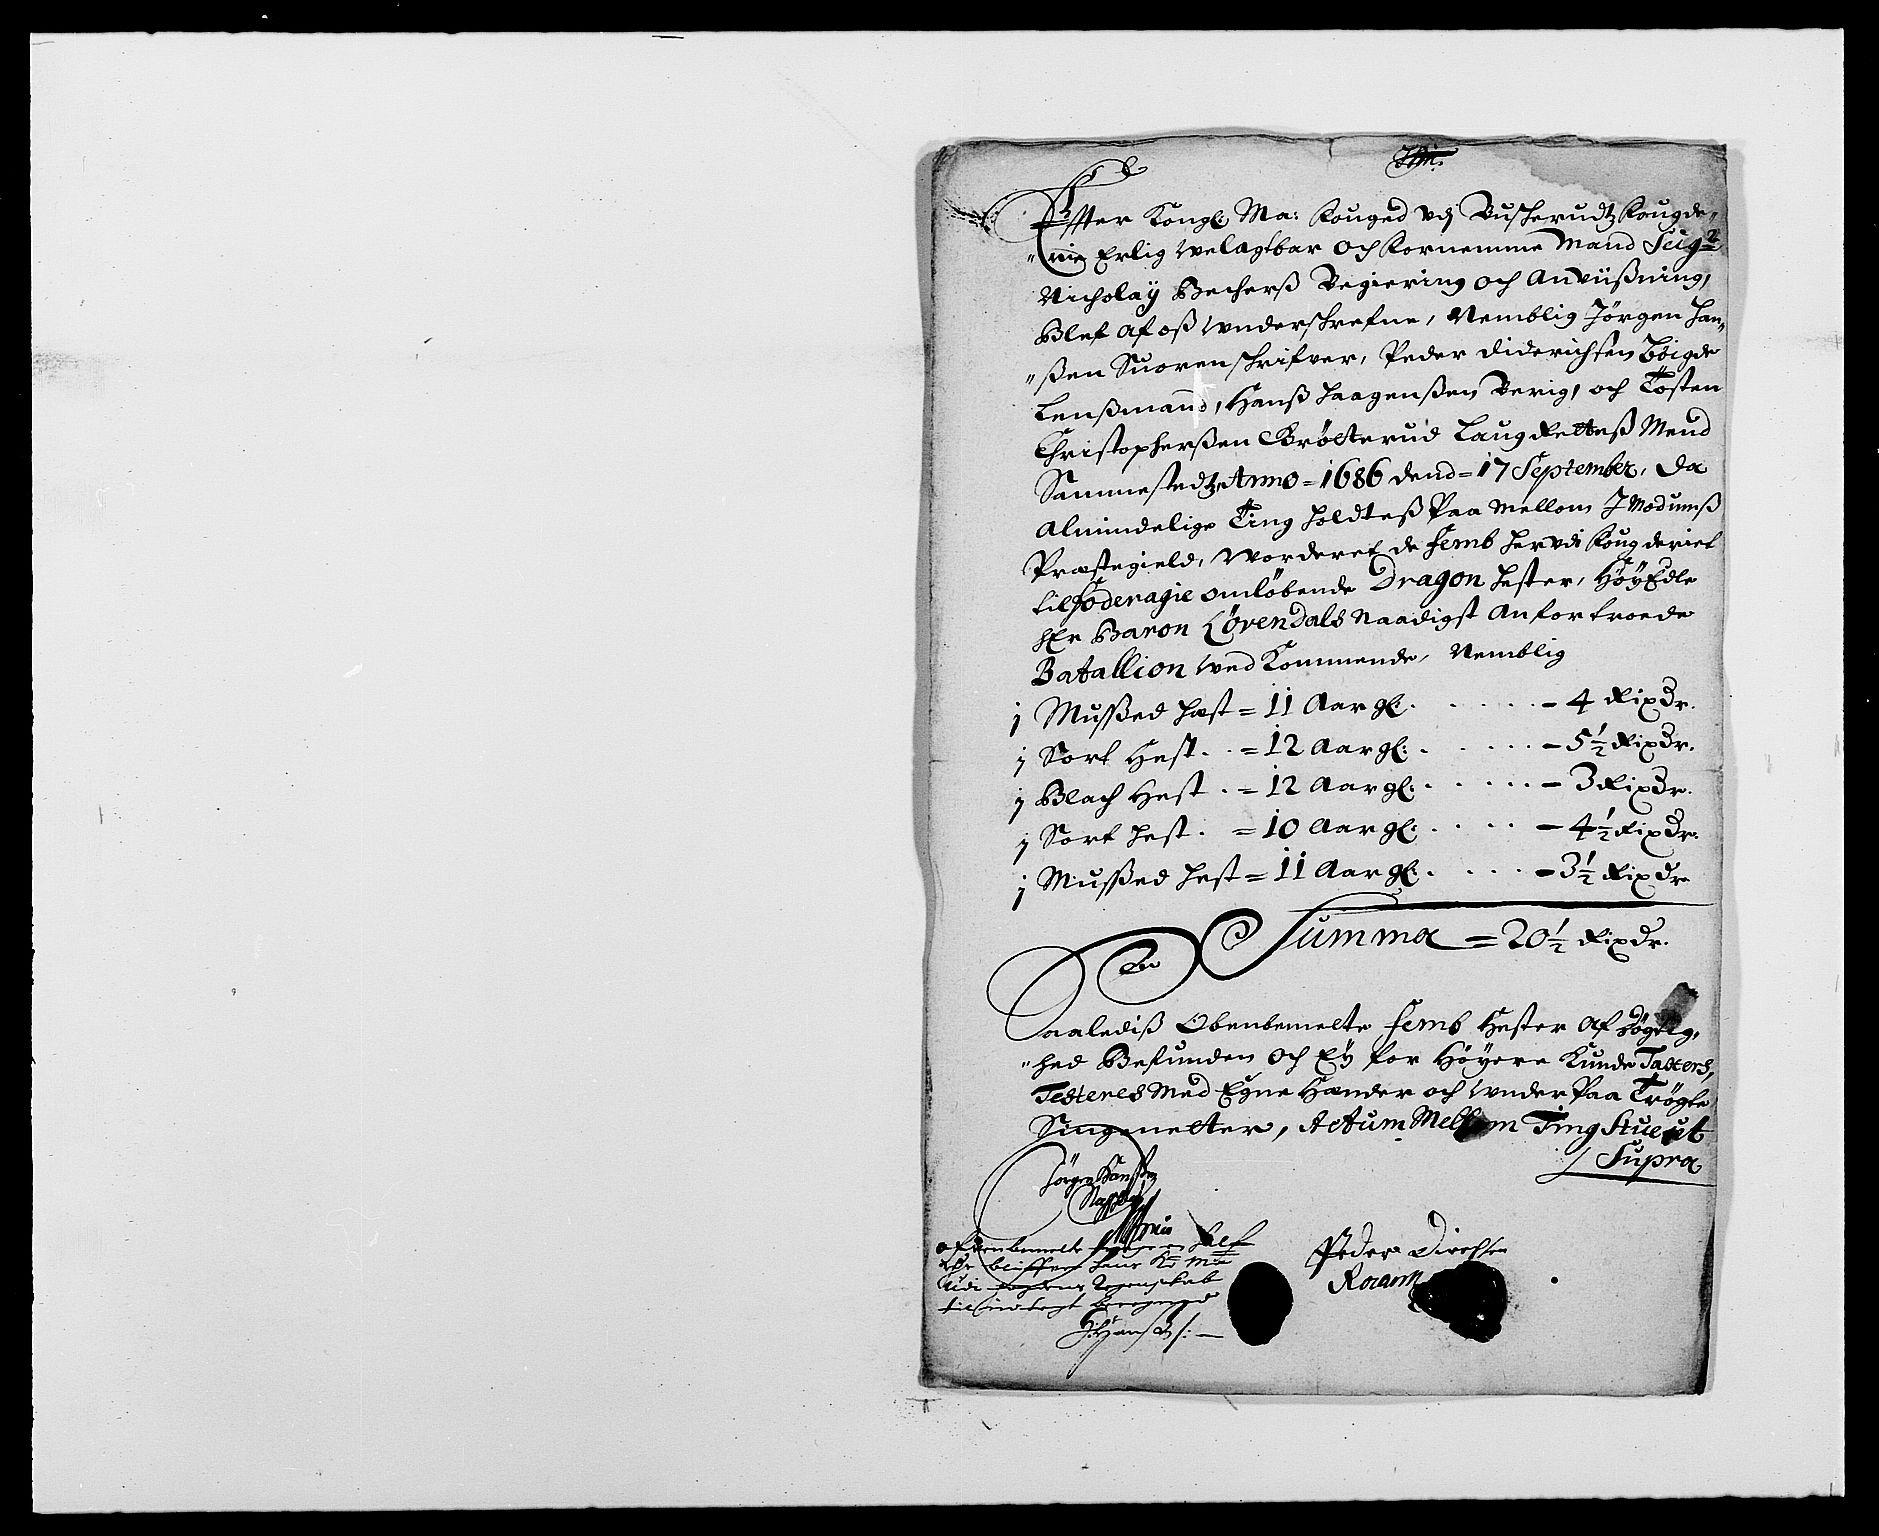 RA, Rentekammeret inntil 1814, Reviderte regnskaper, Fogderegnskap, R25/L1678: Fogderegnskap Buskerud, 1685-1686, s. 368